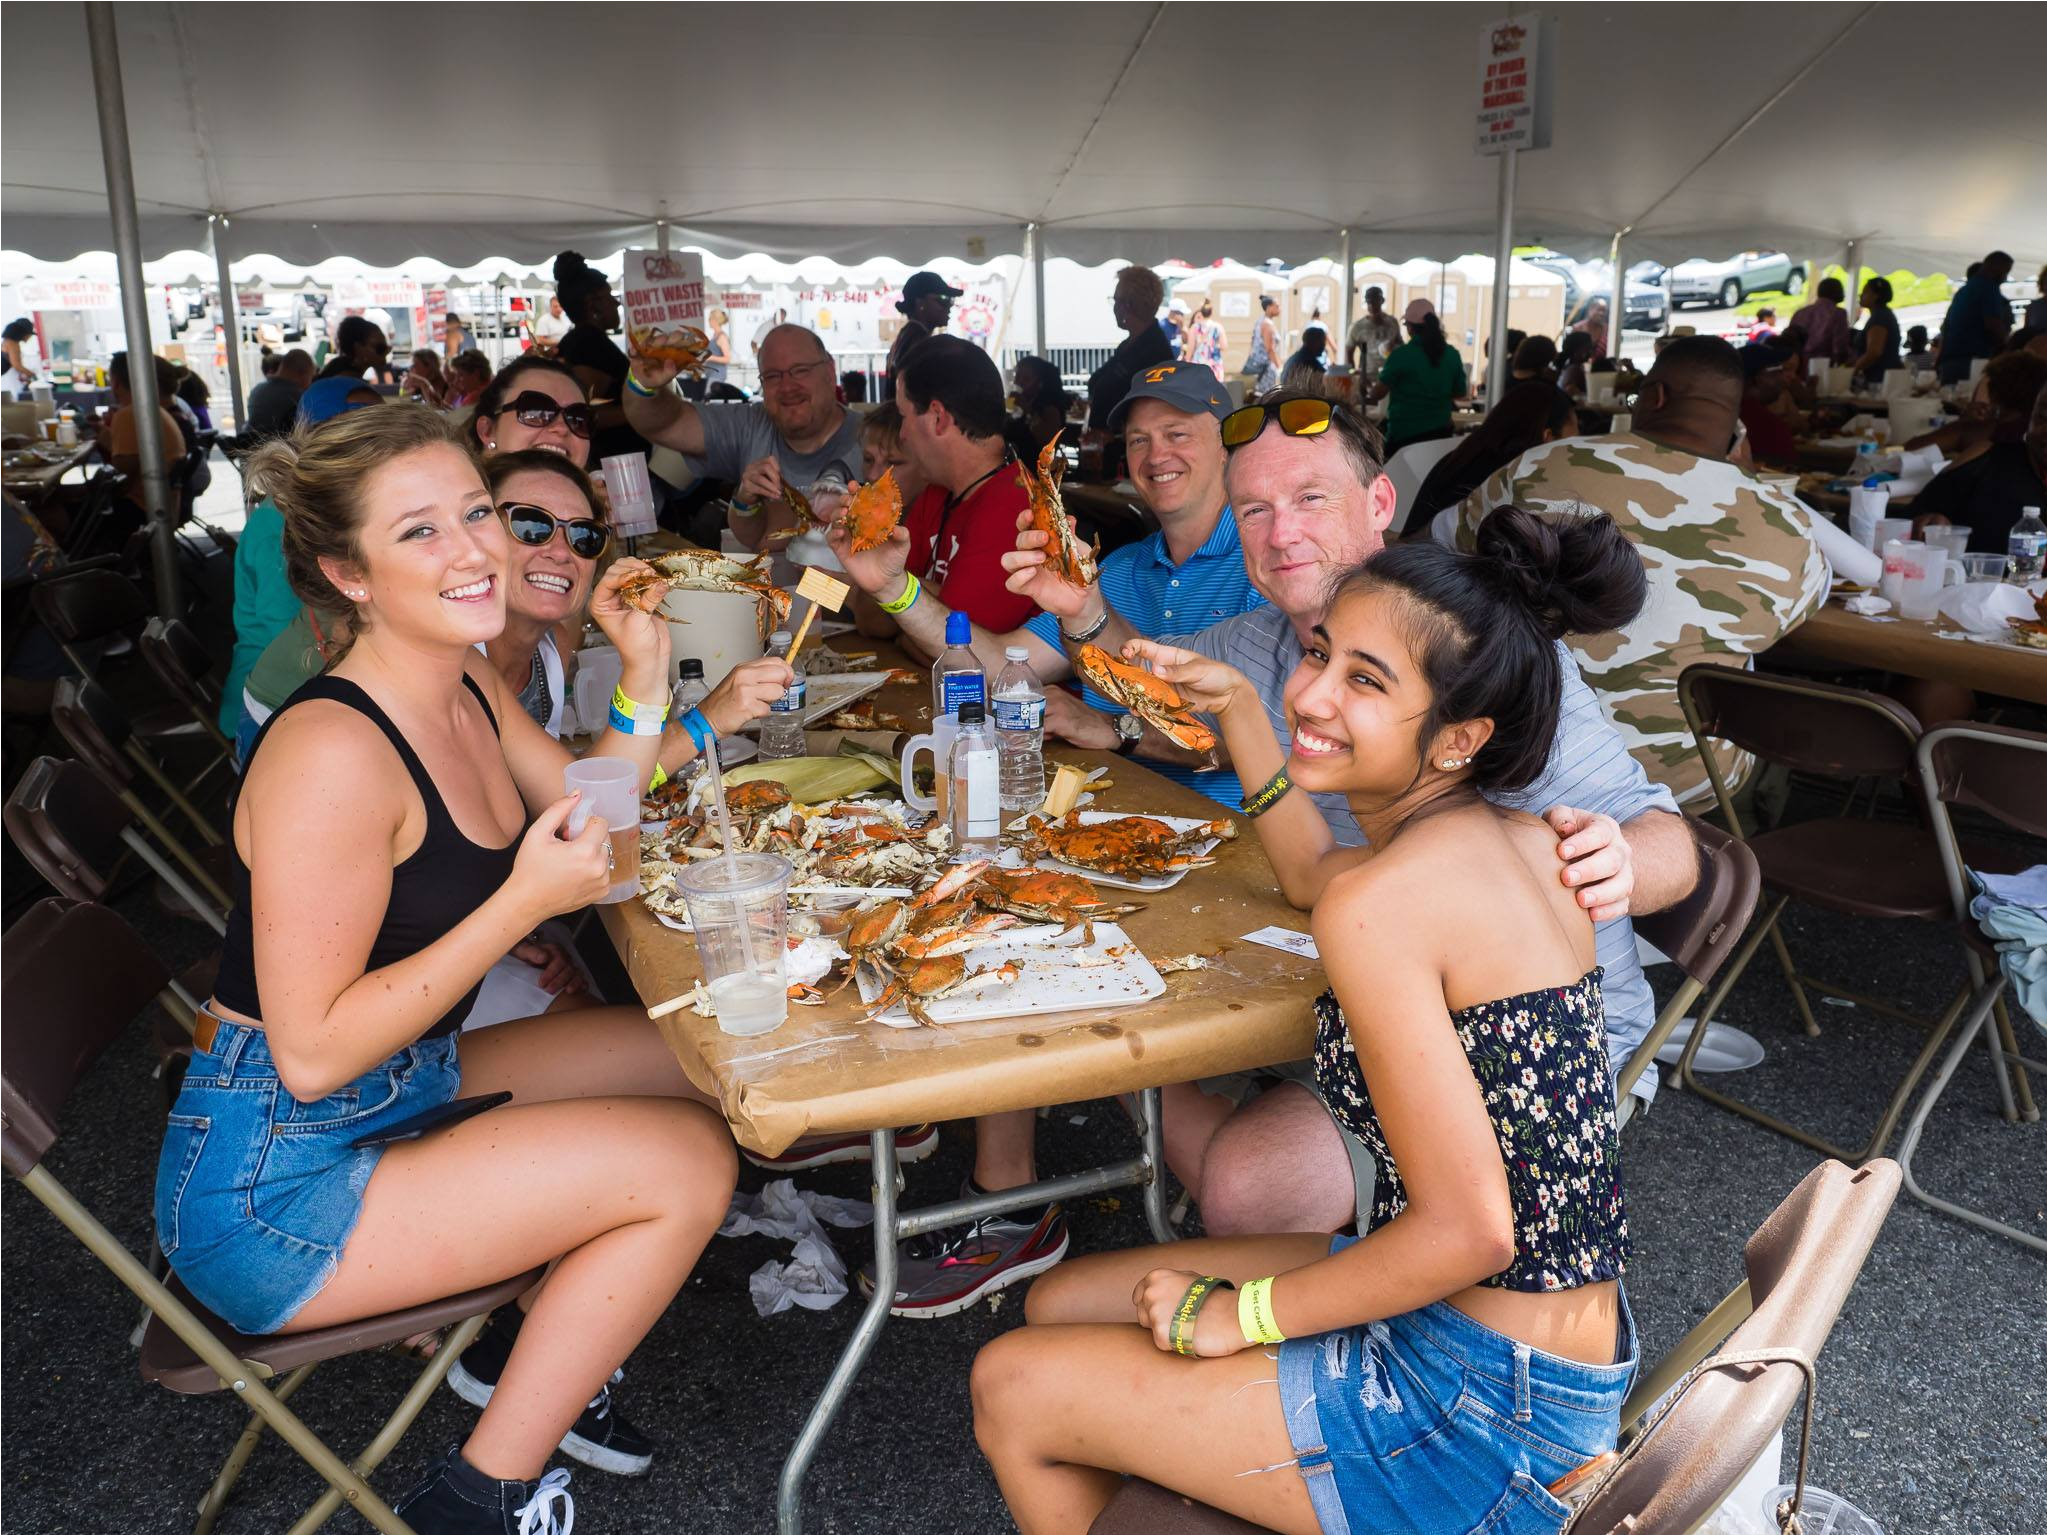 crab wine beer festival baltimore md baltimore inner harbor rash field baltimore 22 june